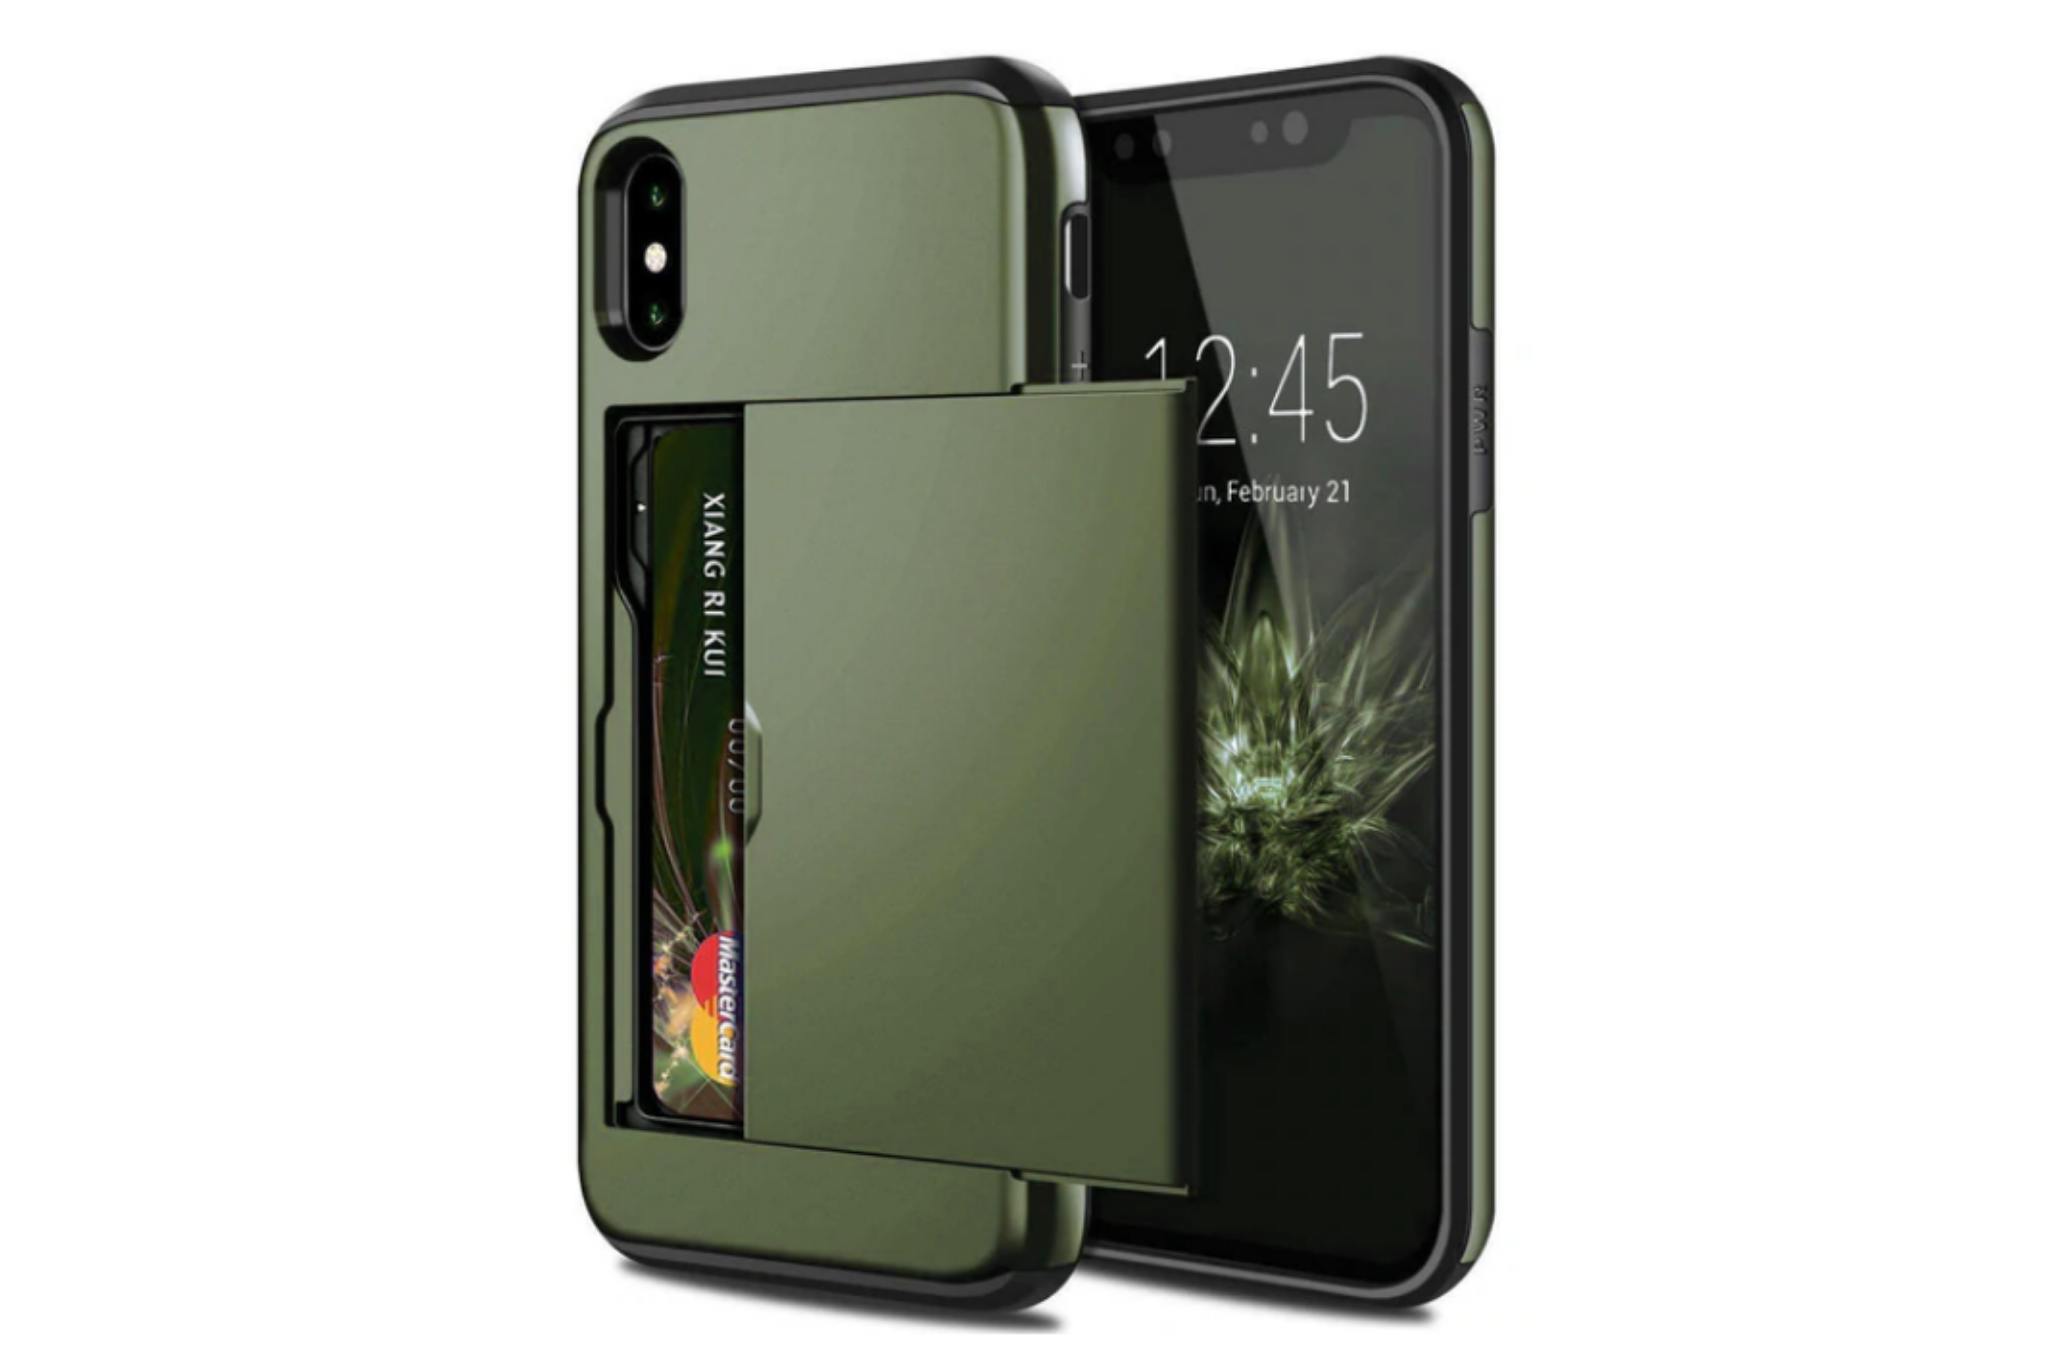 Smartphonehoesje iPhone X / XS | Pasjesschuif groen